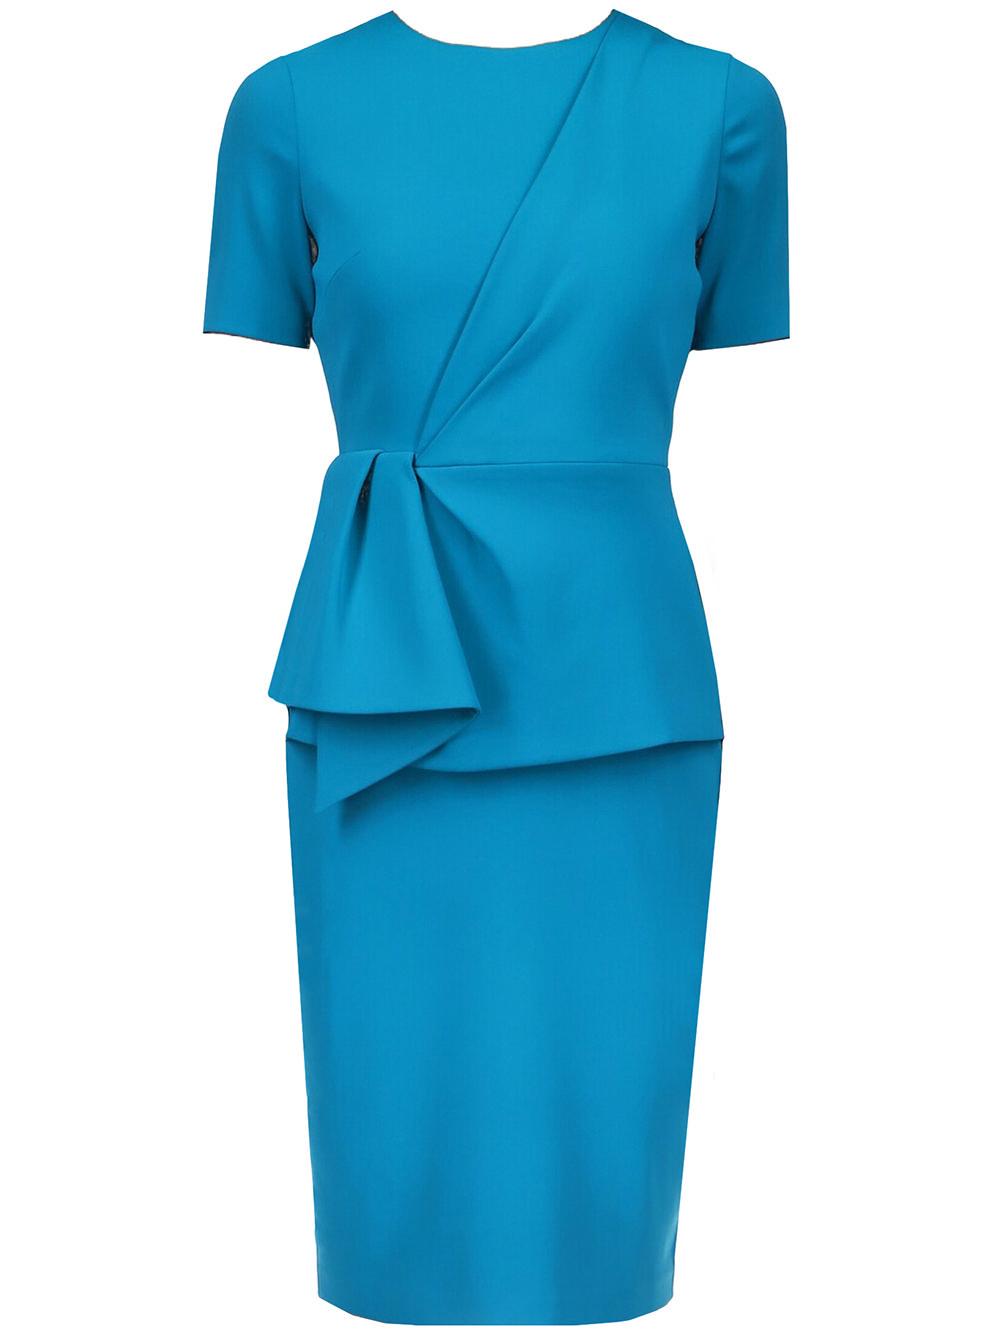 Drape Front Peplum Day Dress Item # BSD4678